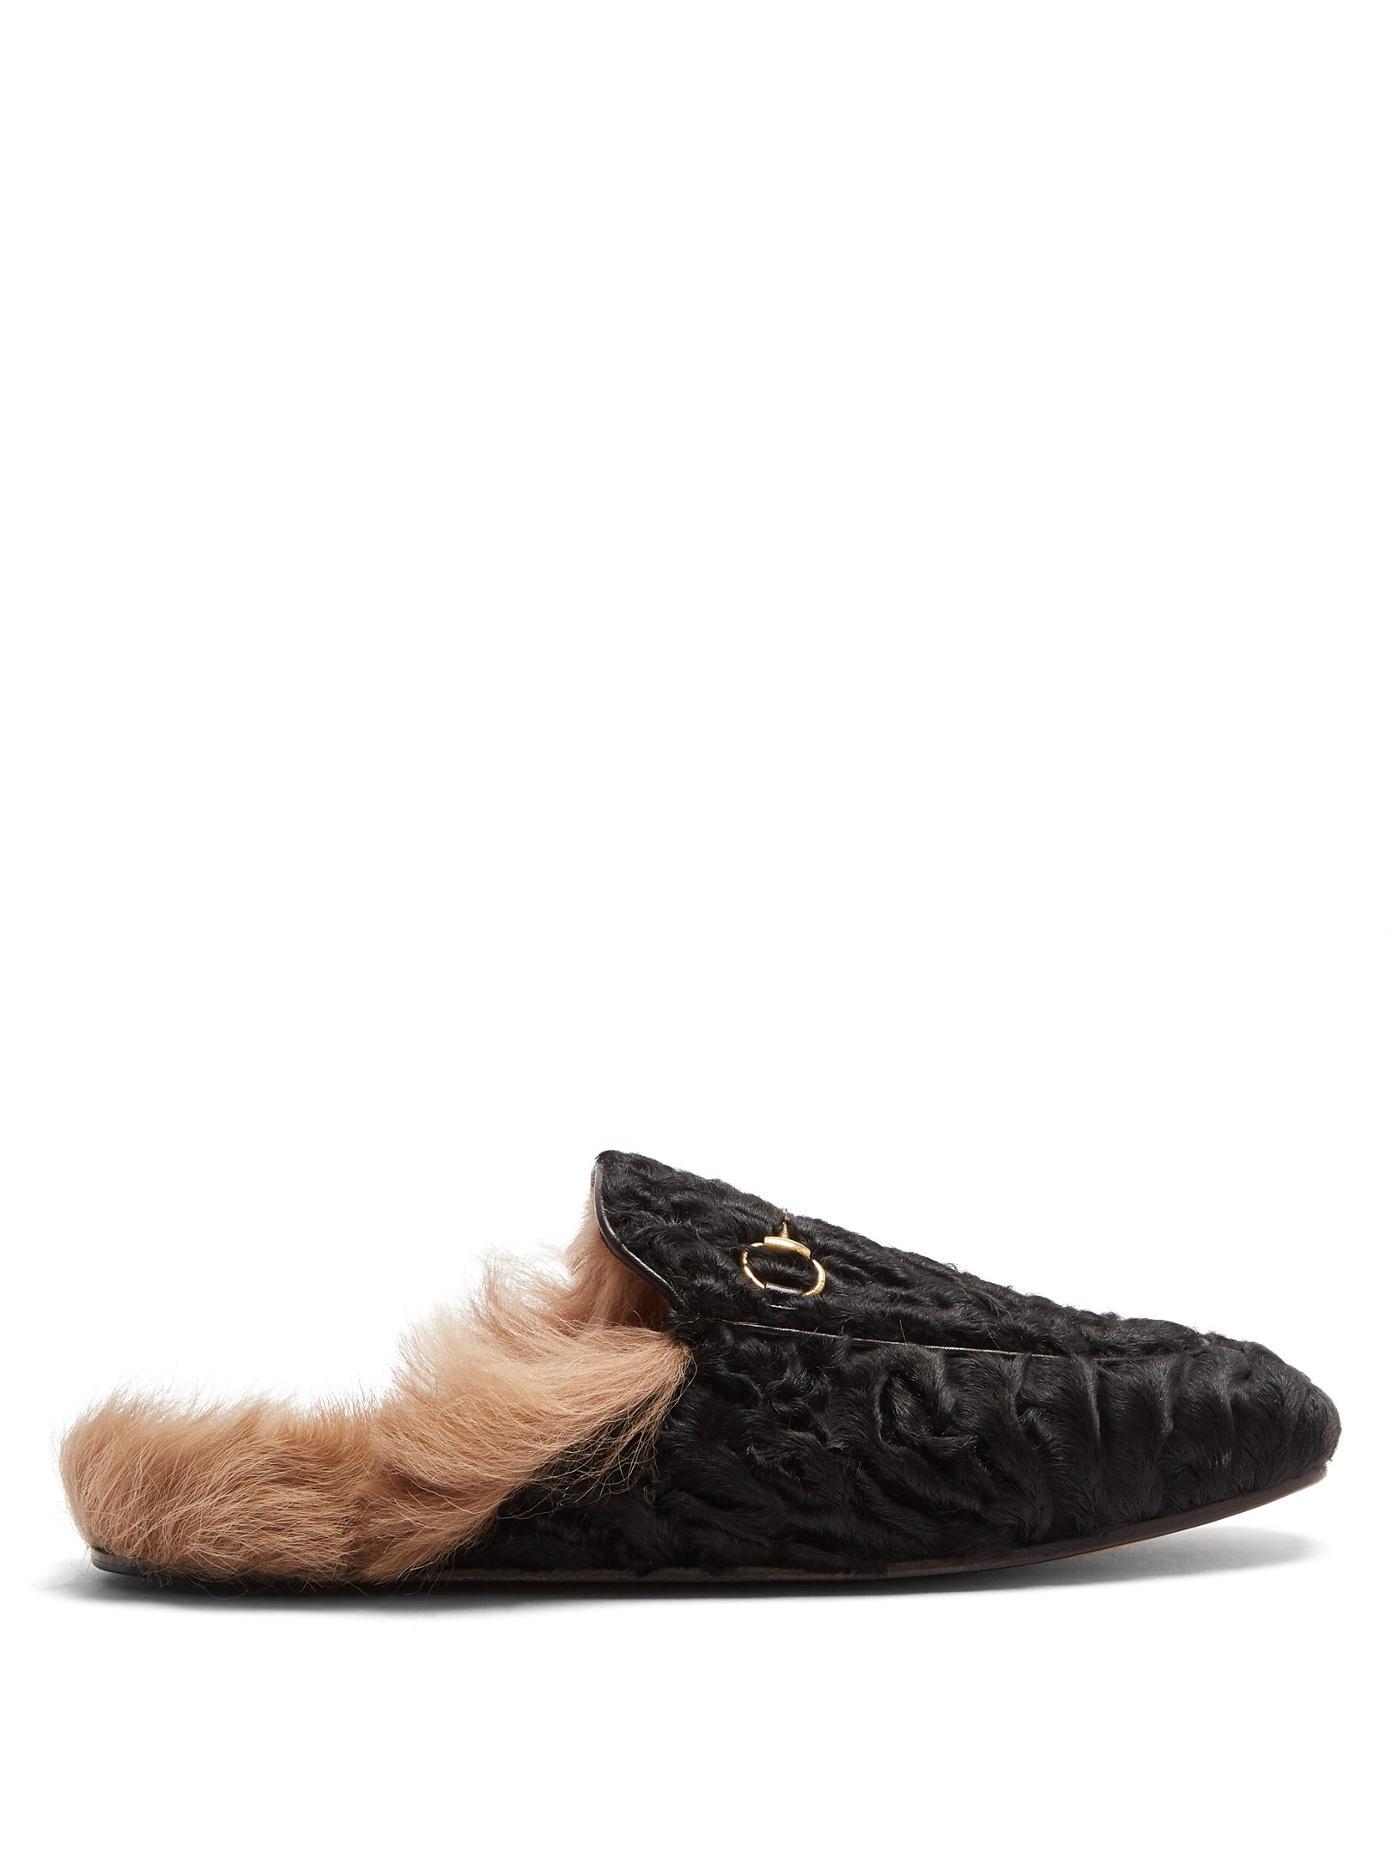 bb8e956c1bc Gucci Princetown Lamb Fur Slippers In Black